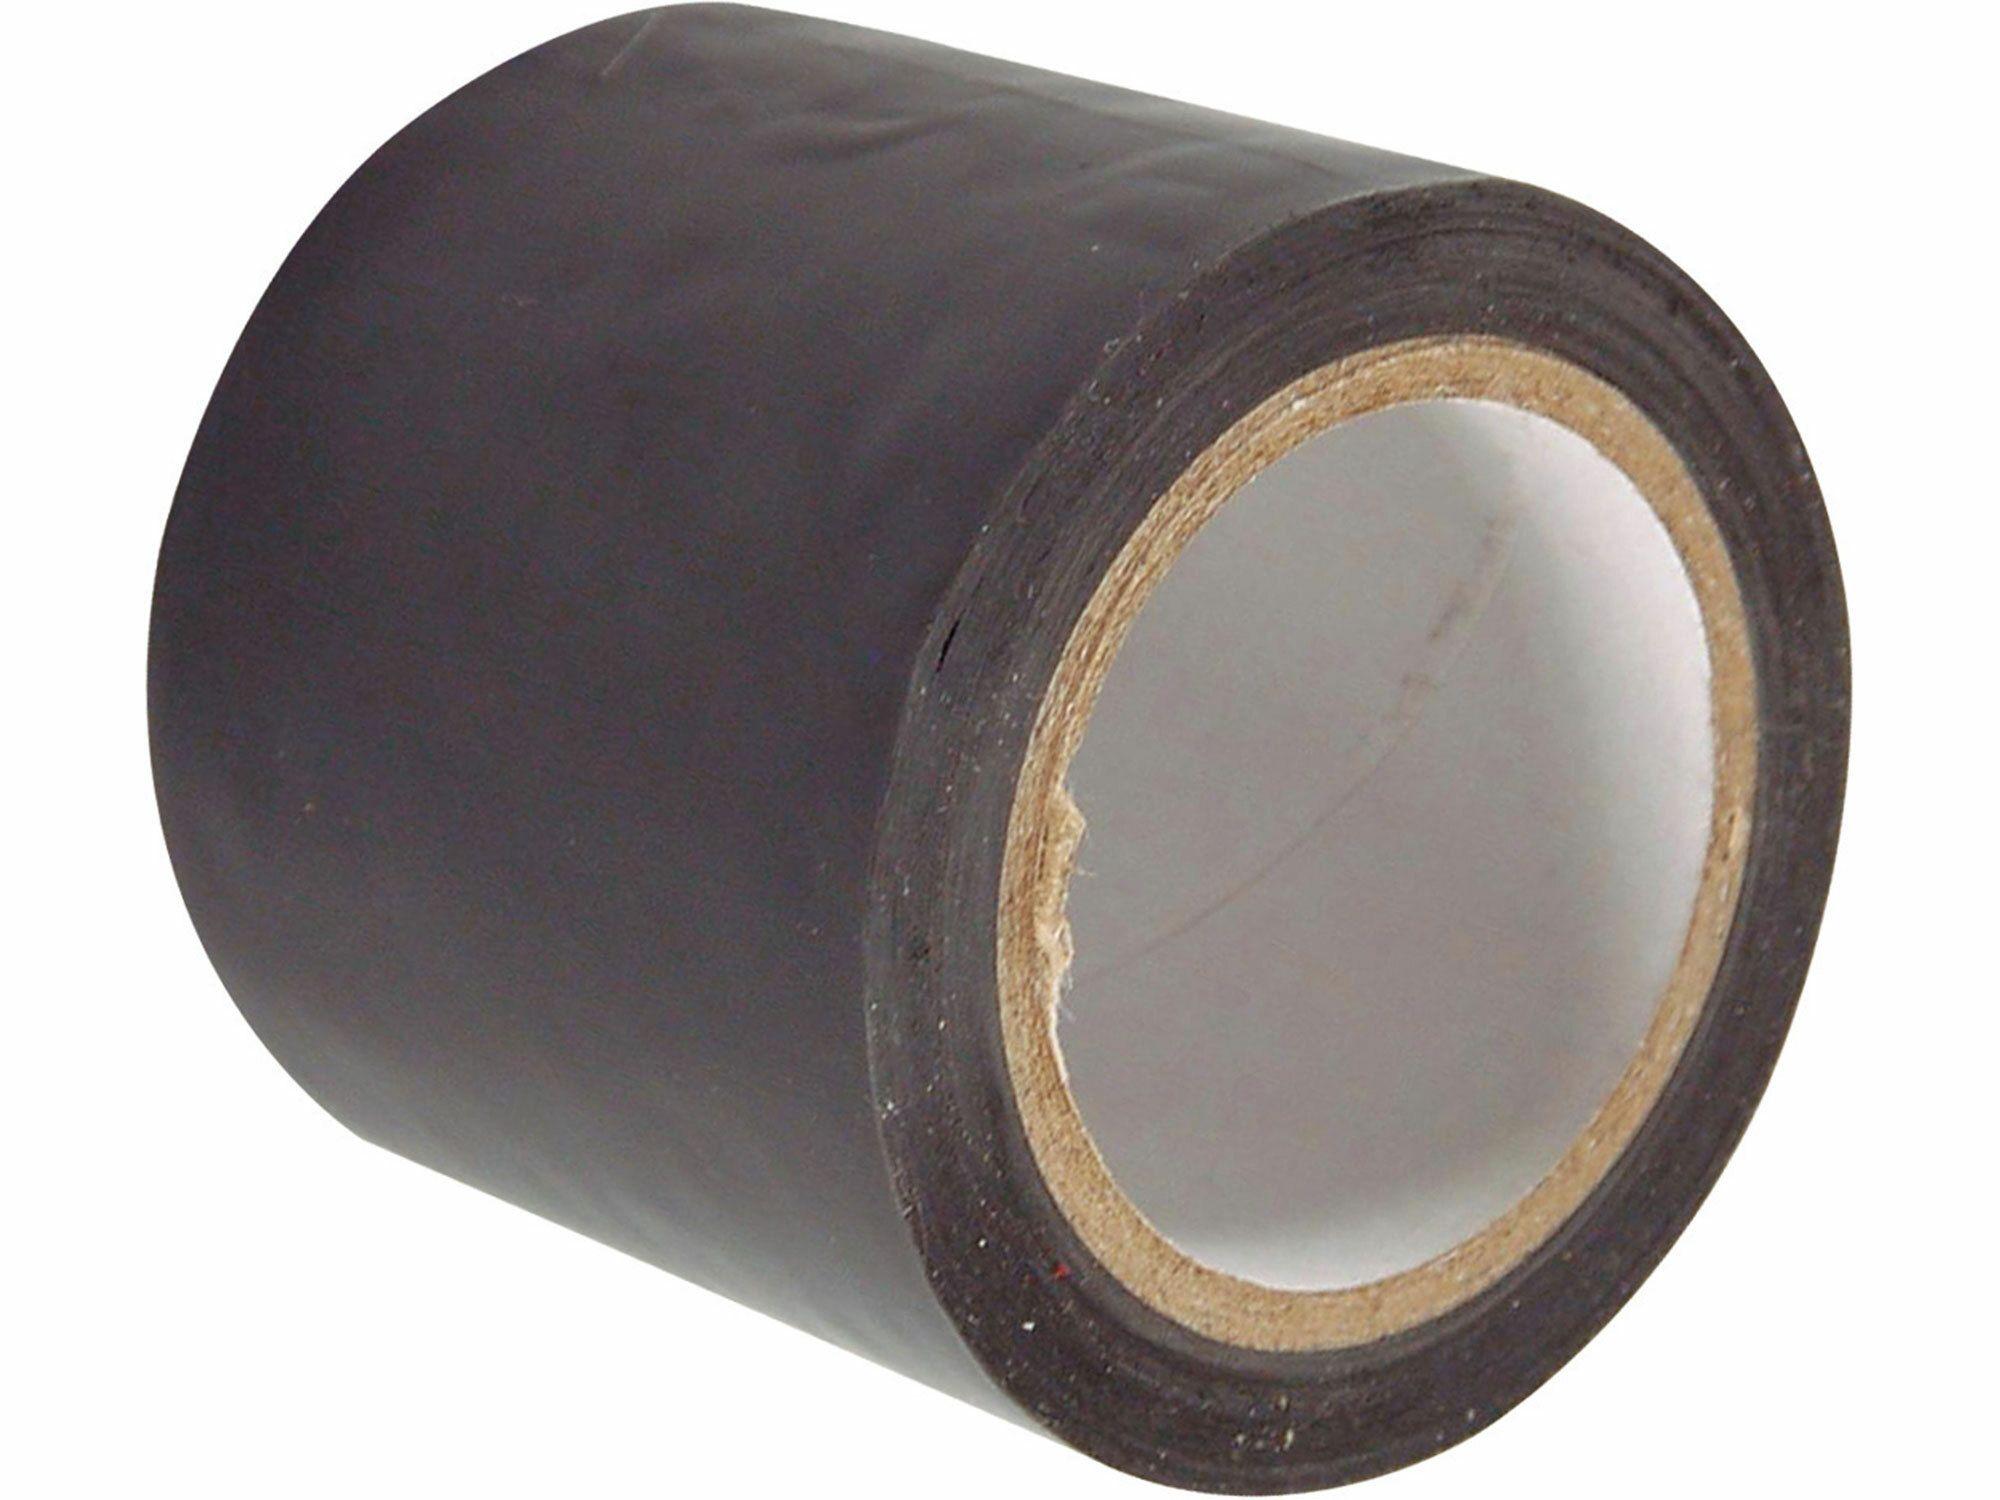 Páska izolační PVC, 50mm x 10m, tloušťka 0,13mm, černá EXTOL-CRAFT